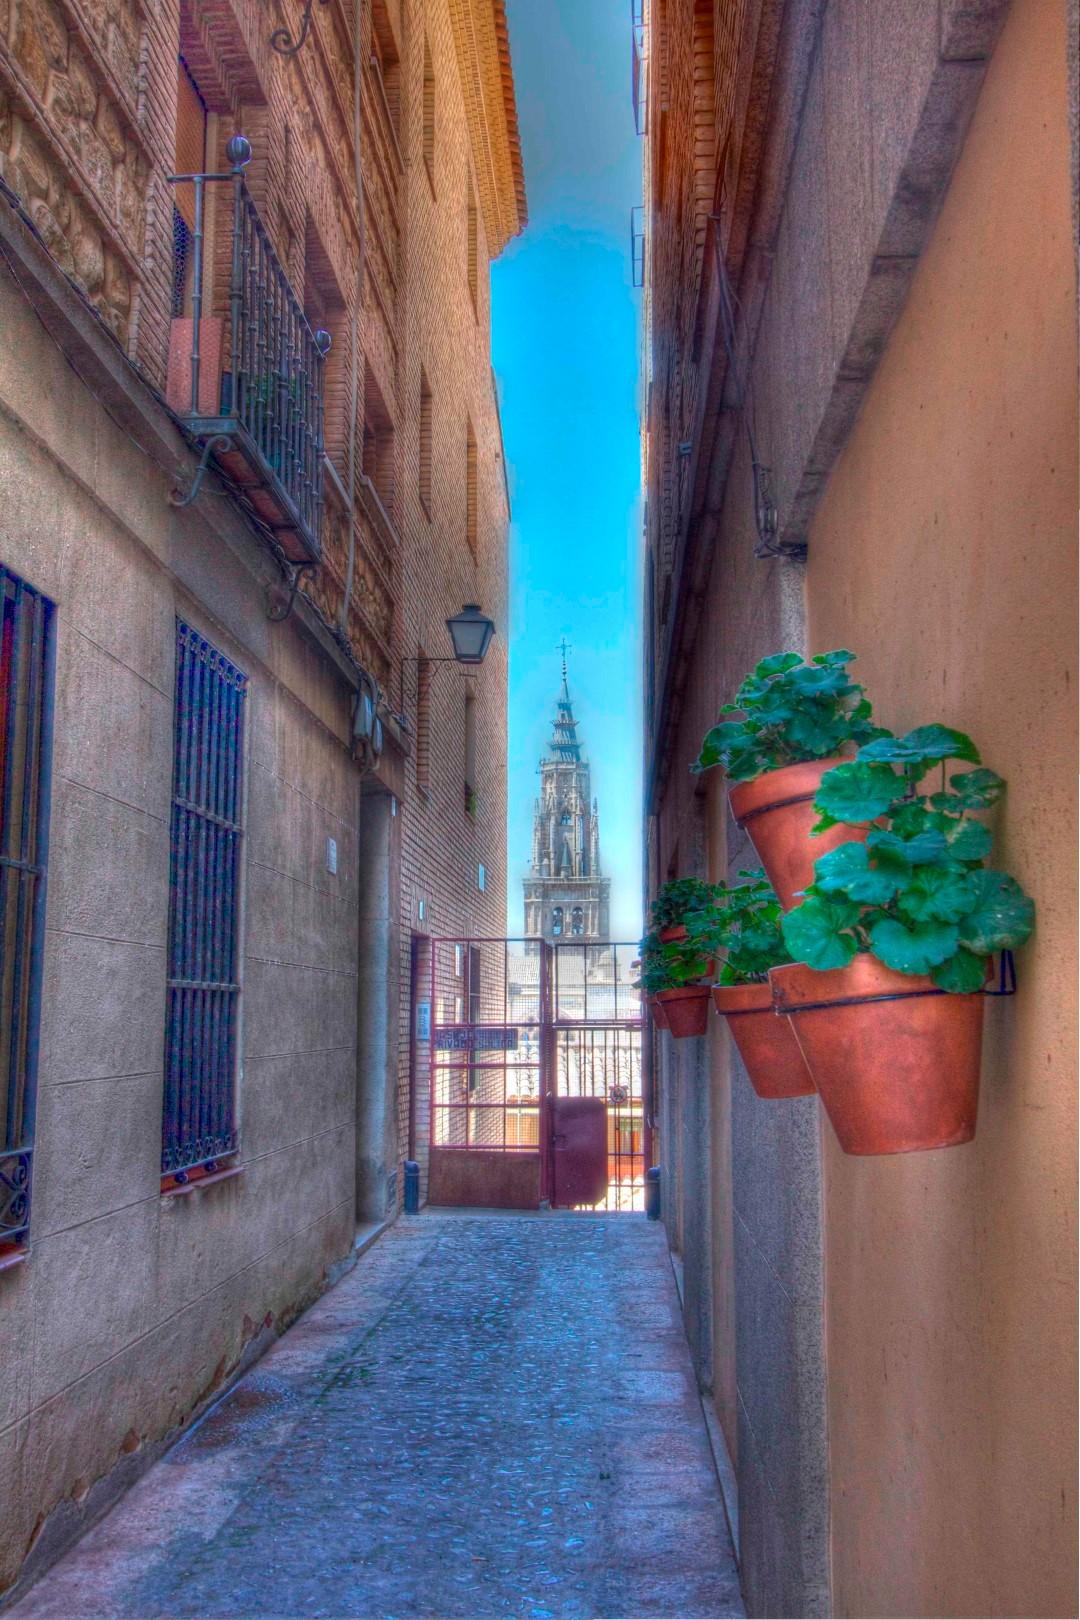 Toledo, Spain, Travelers Roundtable, Robert Bundy, Flowers